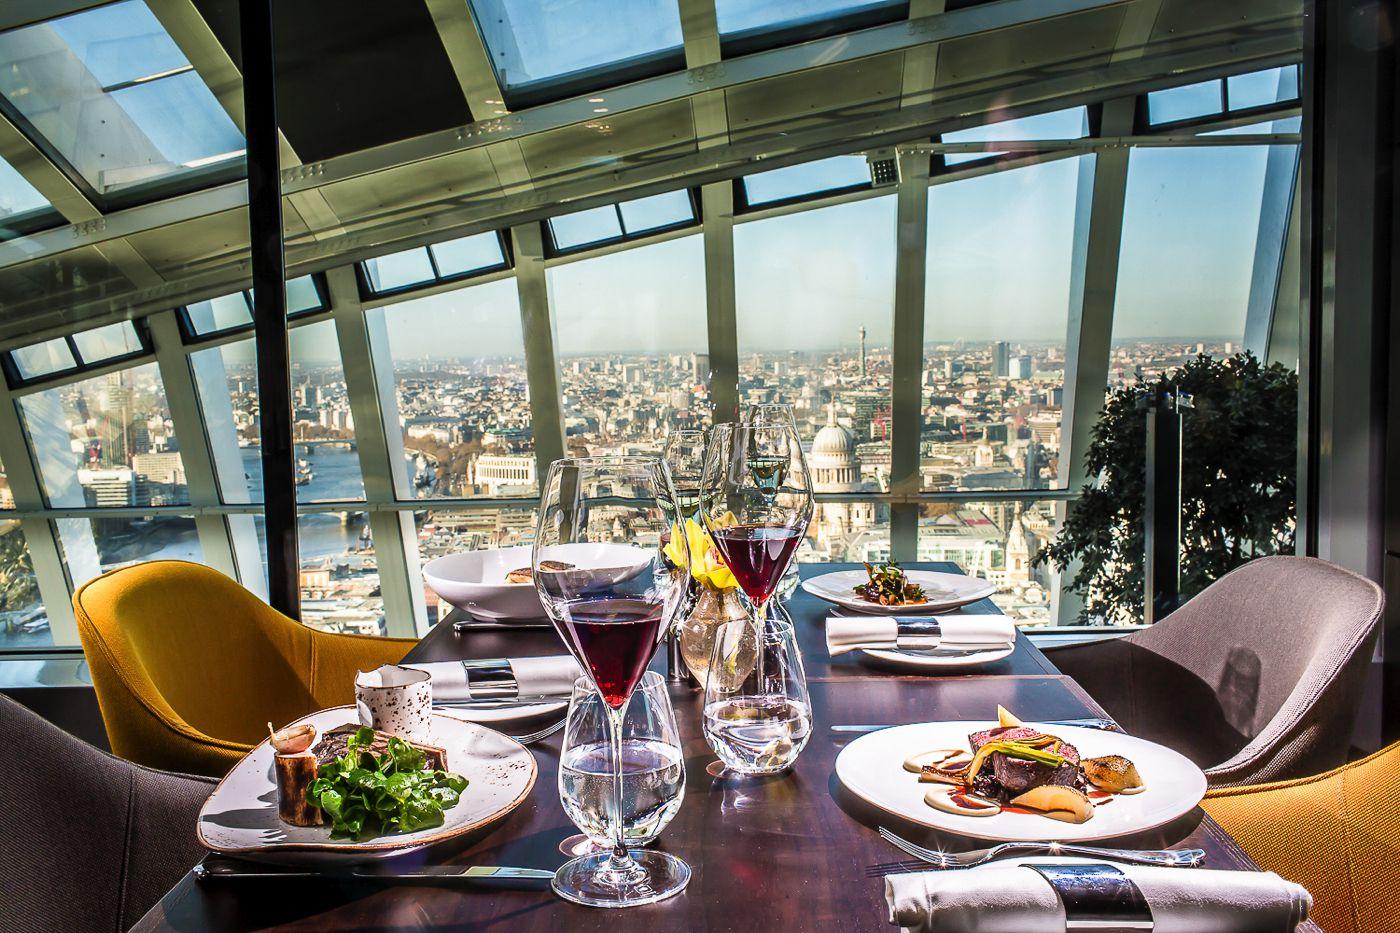 Sky Gardens, London, 20 Fenchurch Street, Rhubard, Amazing Views Of London (9)